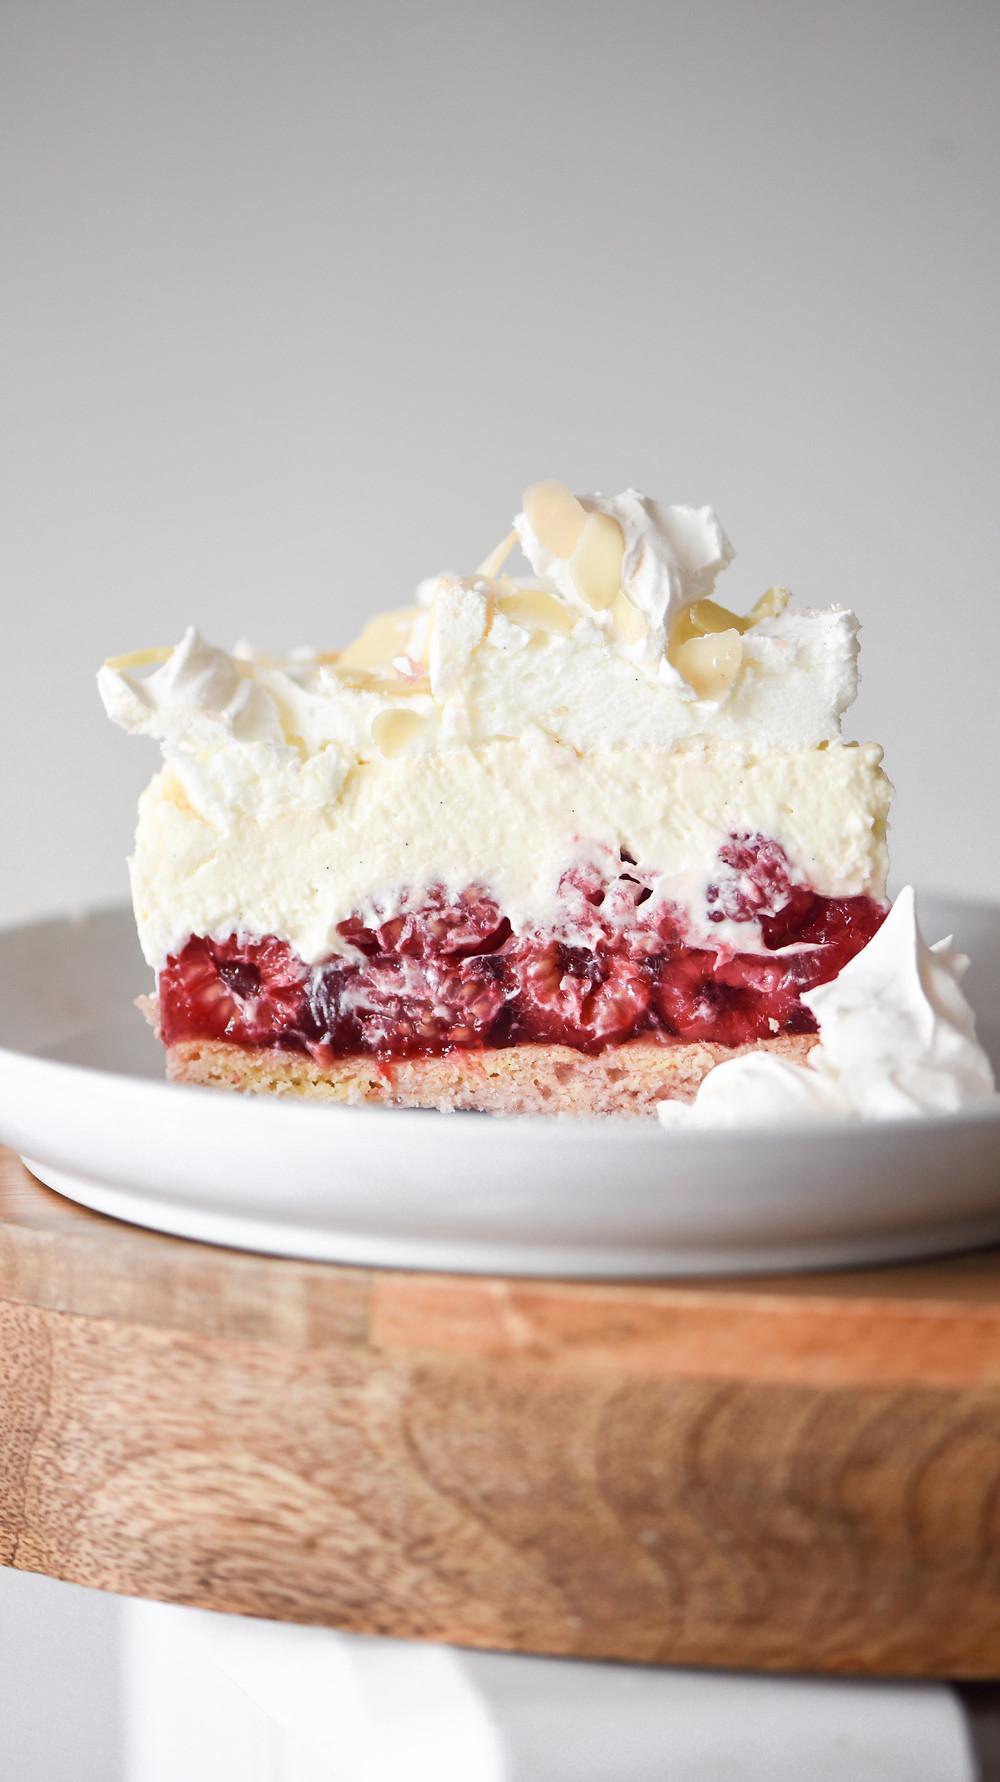 Raspberry Cloud Cake (Malinowa Chmurka)